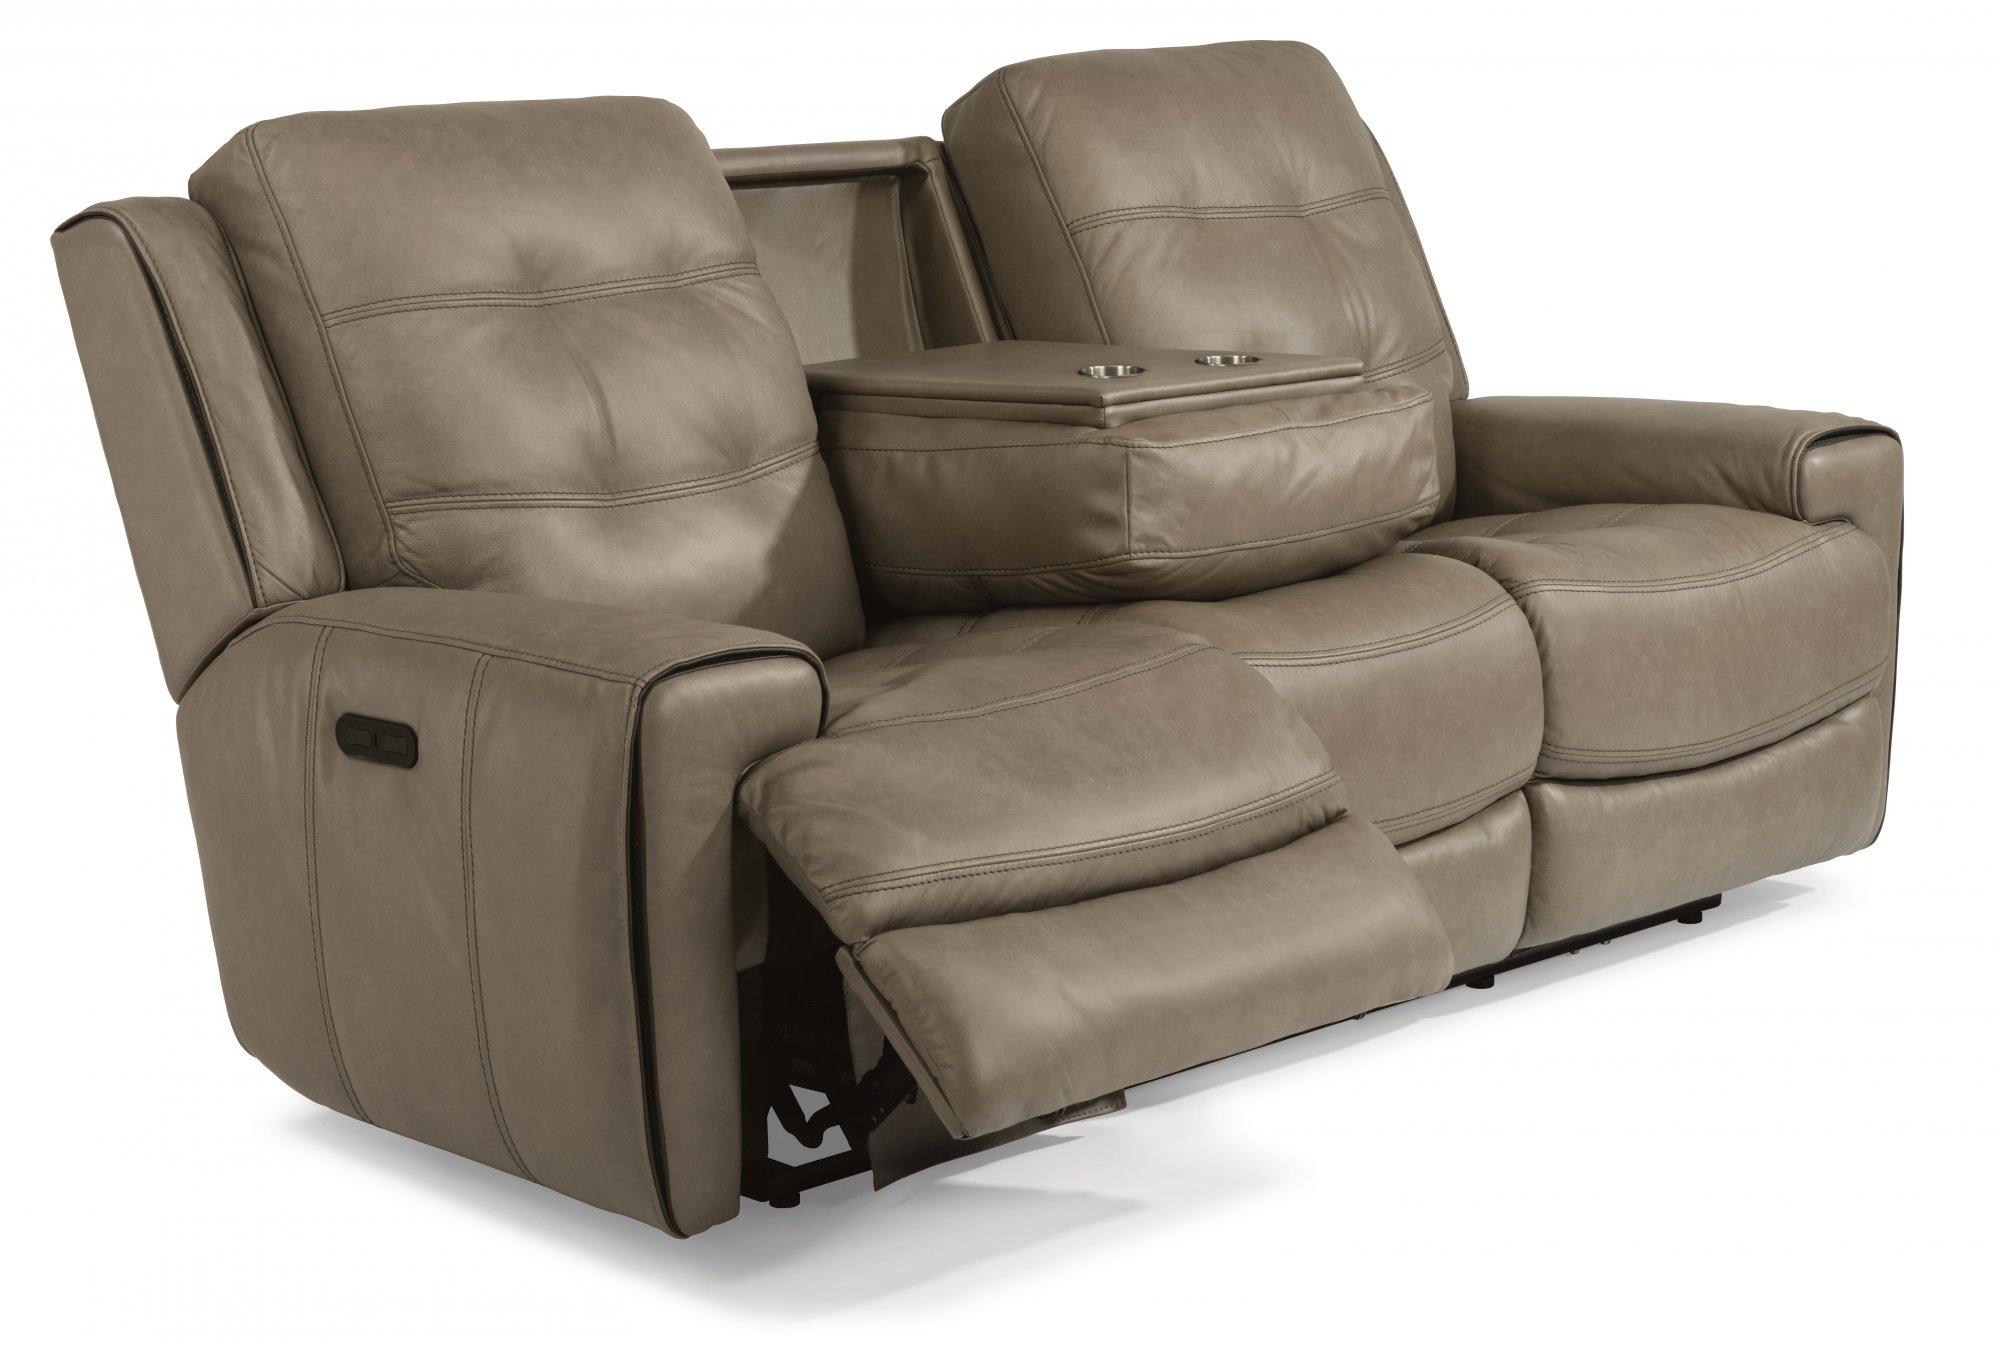 Flexsteel 1681 62ph Wicklow Leather Power Reclining Sofa